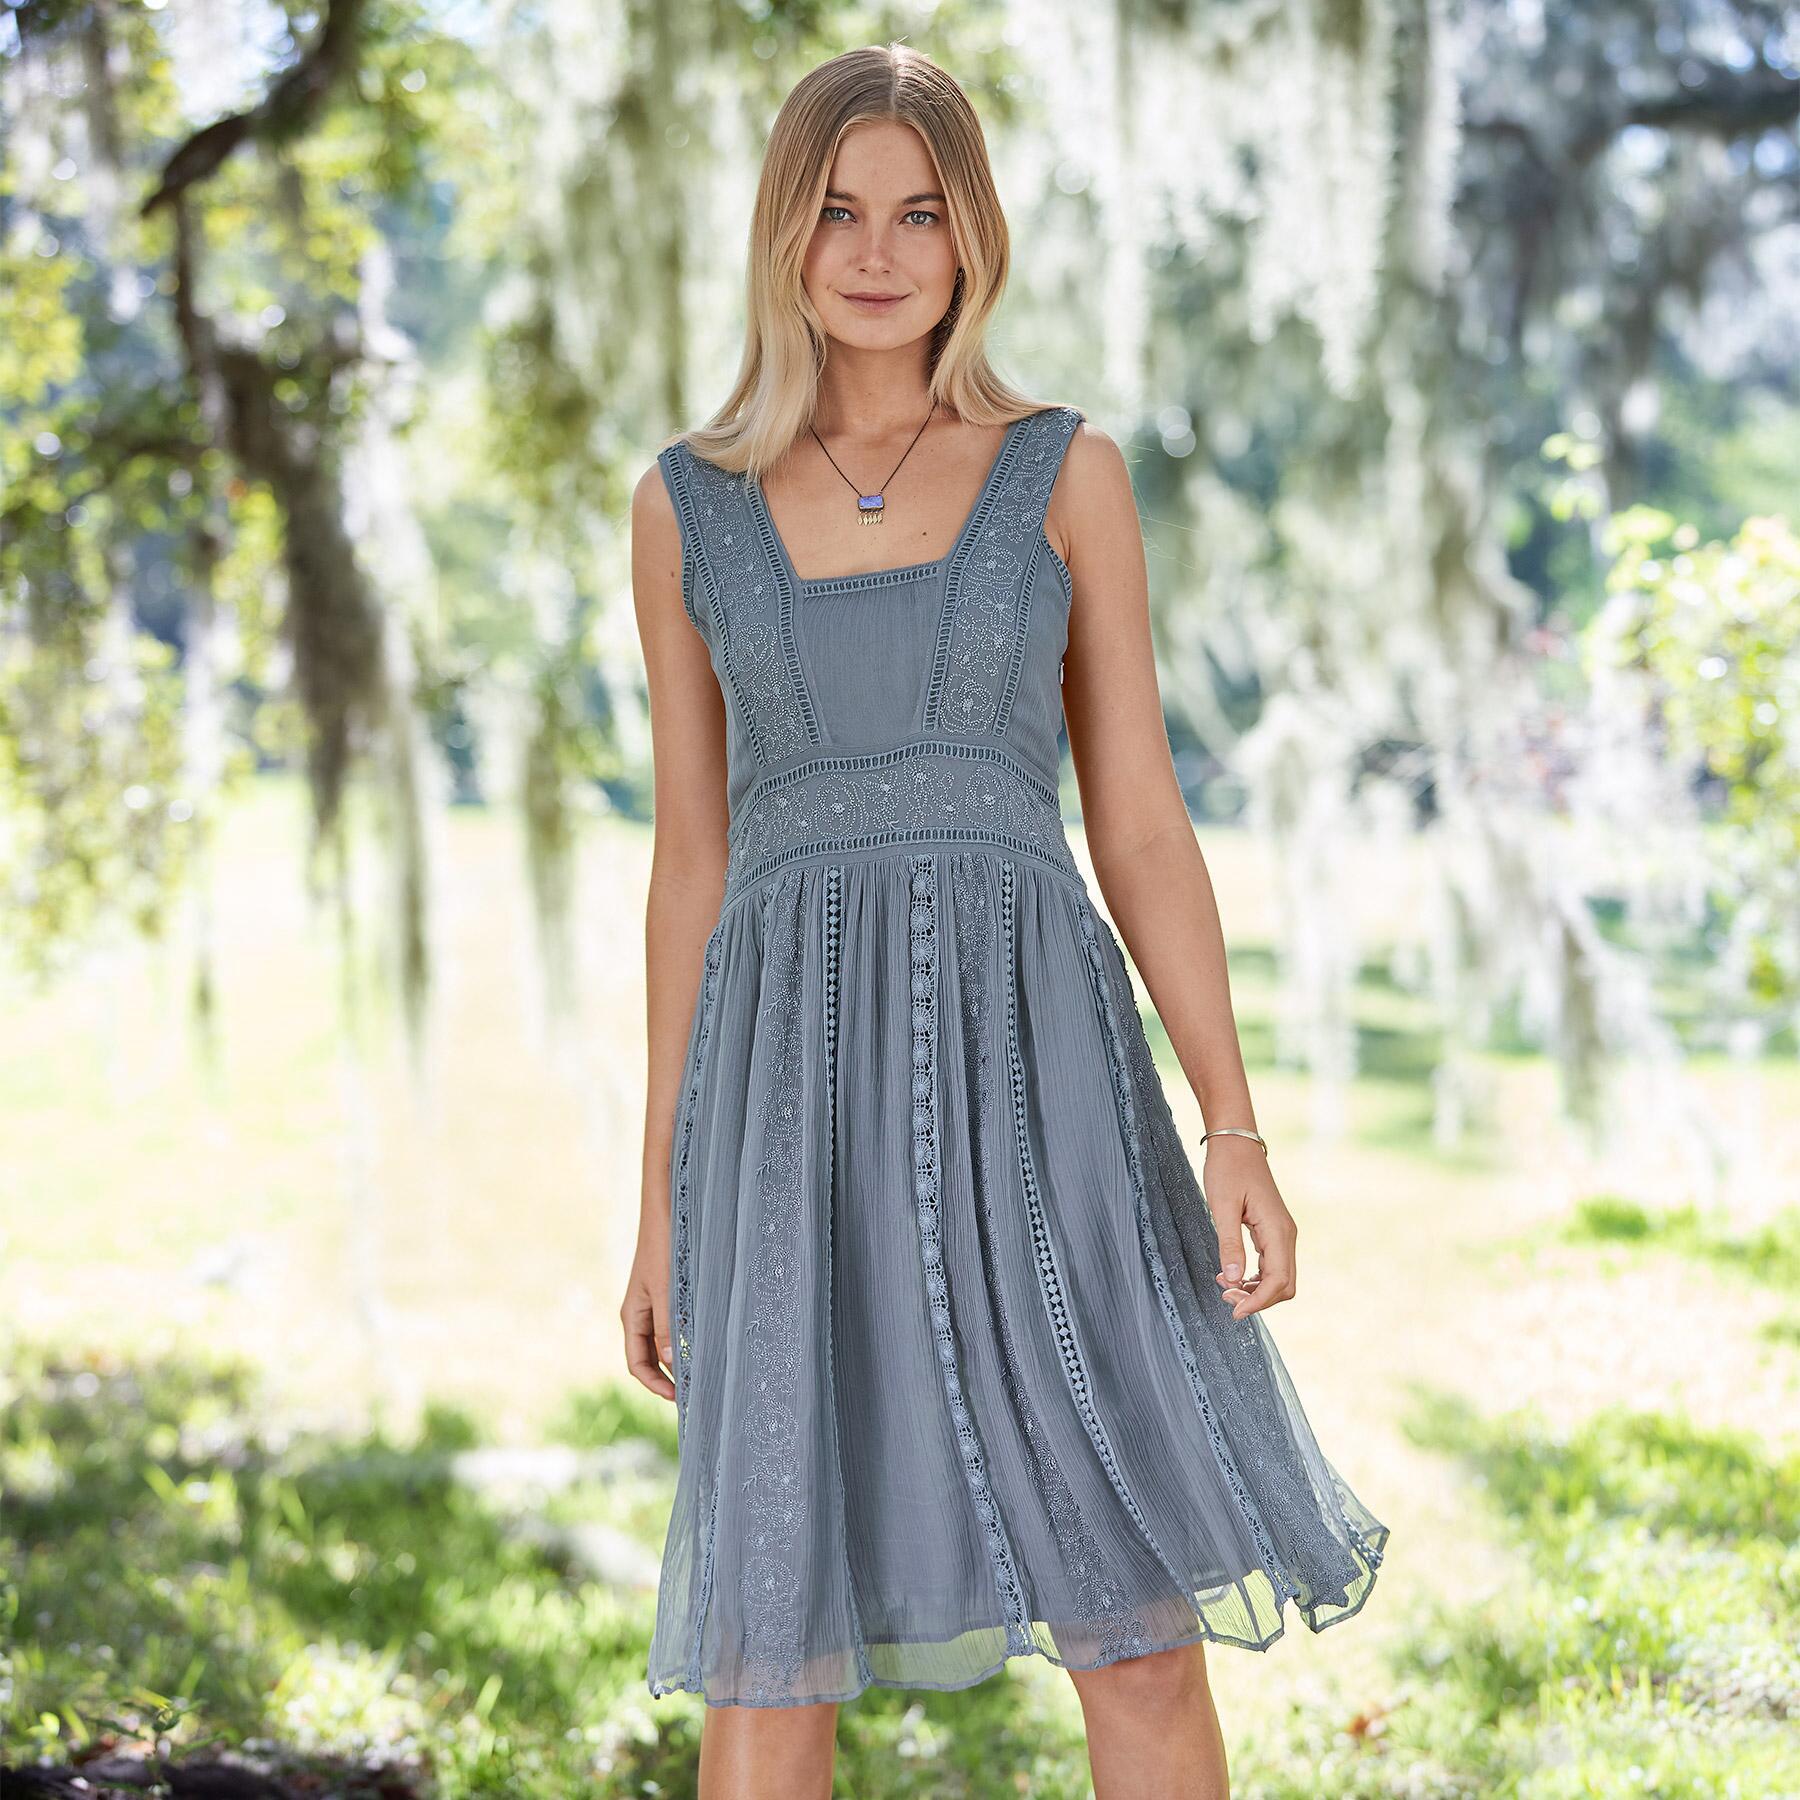 JOLI EMBROIDERY DRESS: View 1